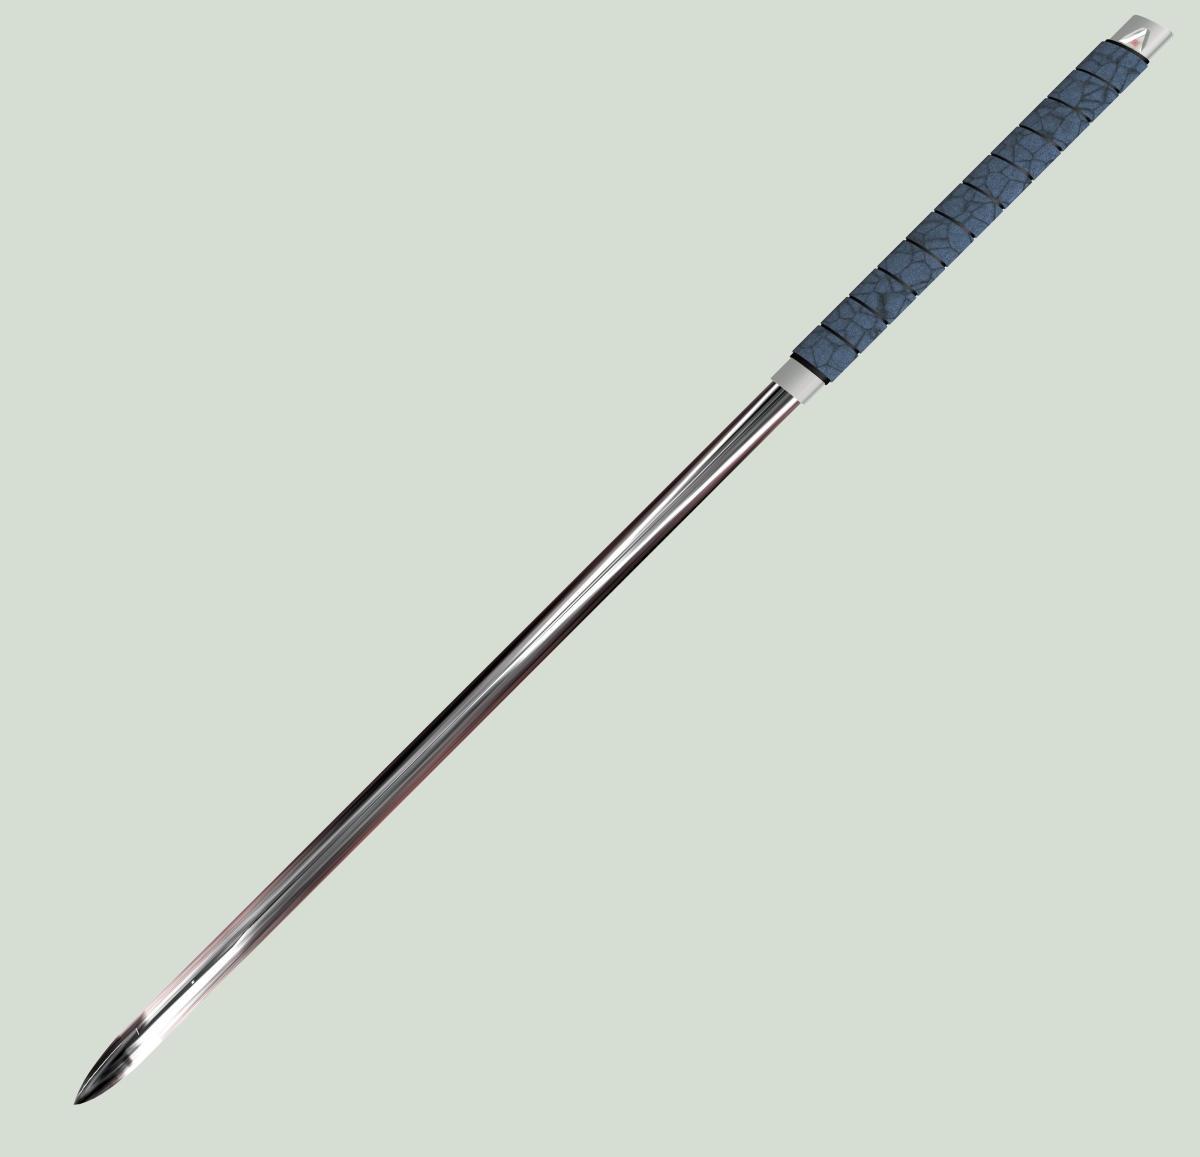 Long Sword By Lauwfeyh On Deviantart